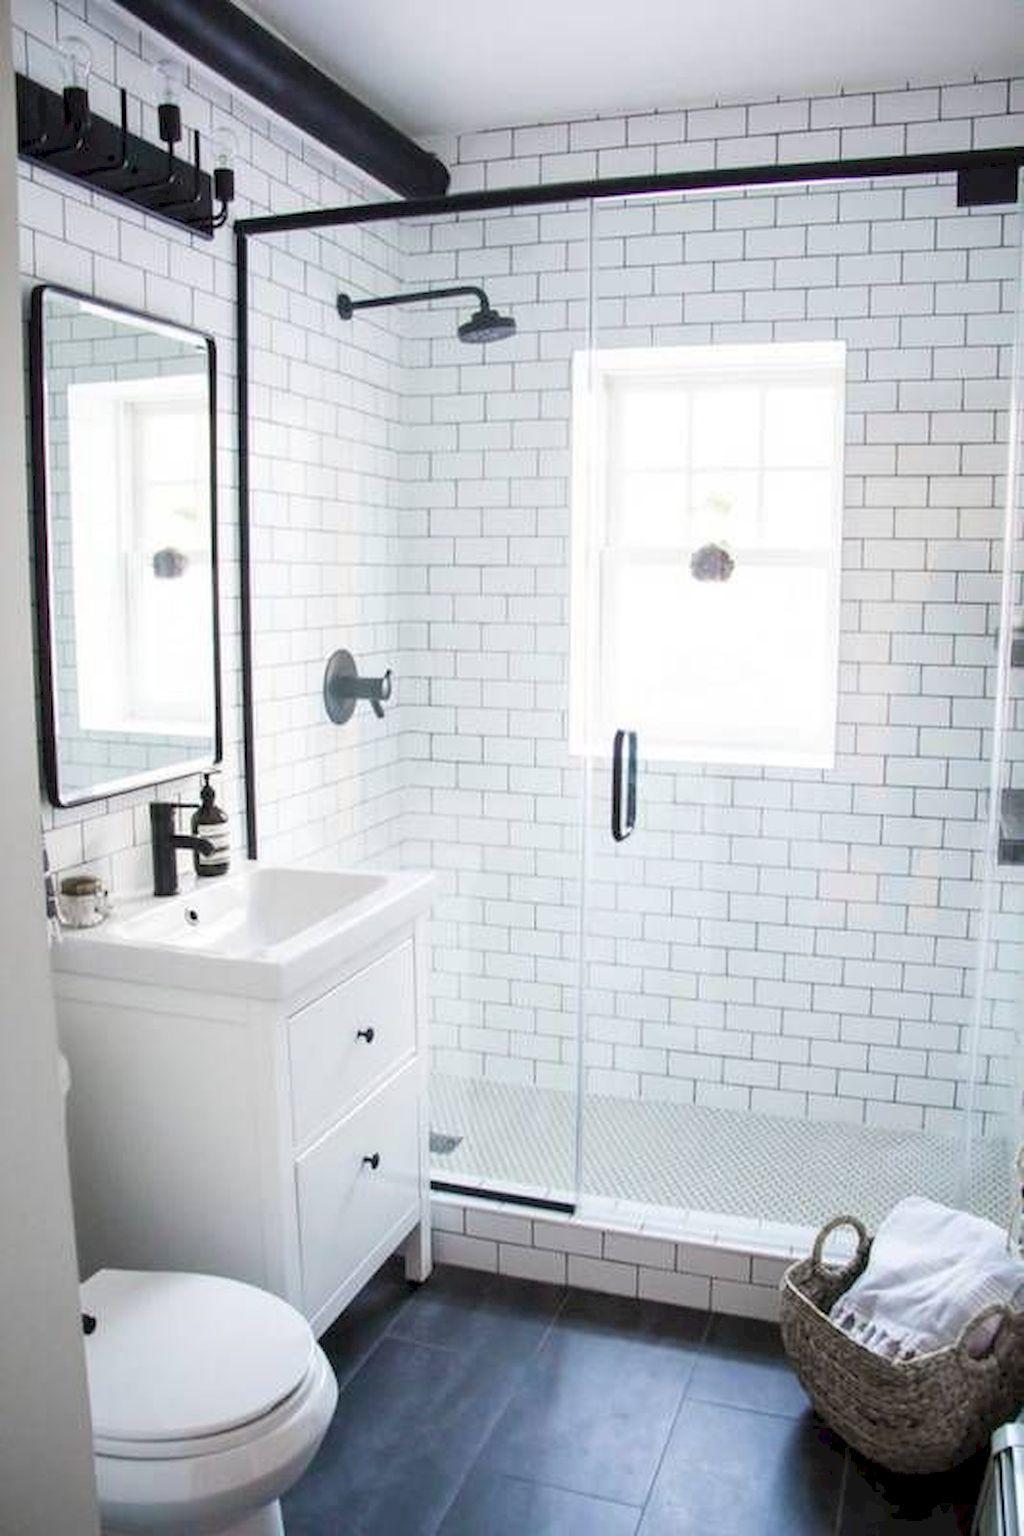 Luxury subway tile shower designs ideas (86)   bathroom ideas ...